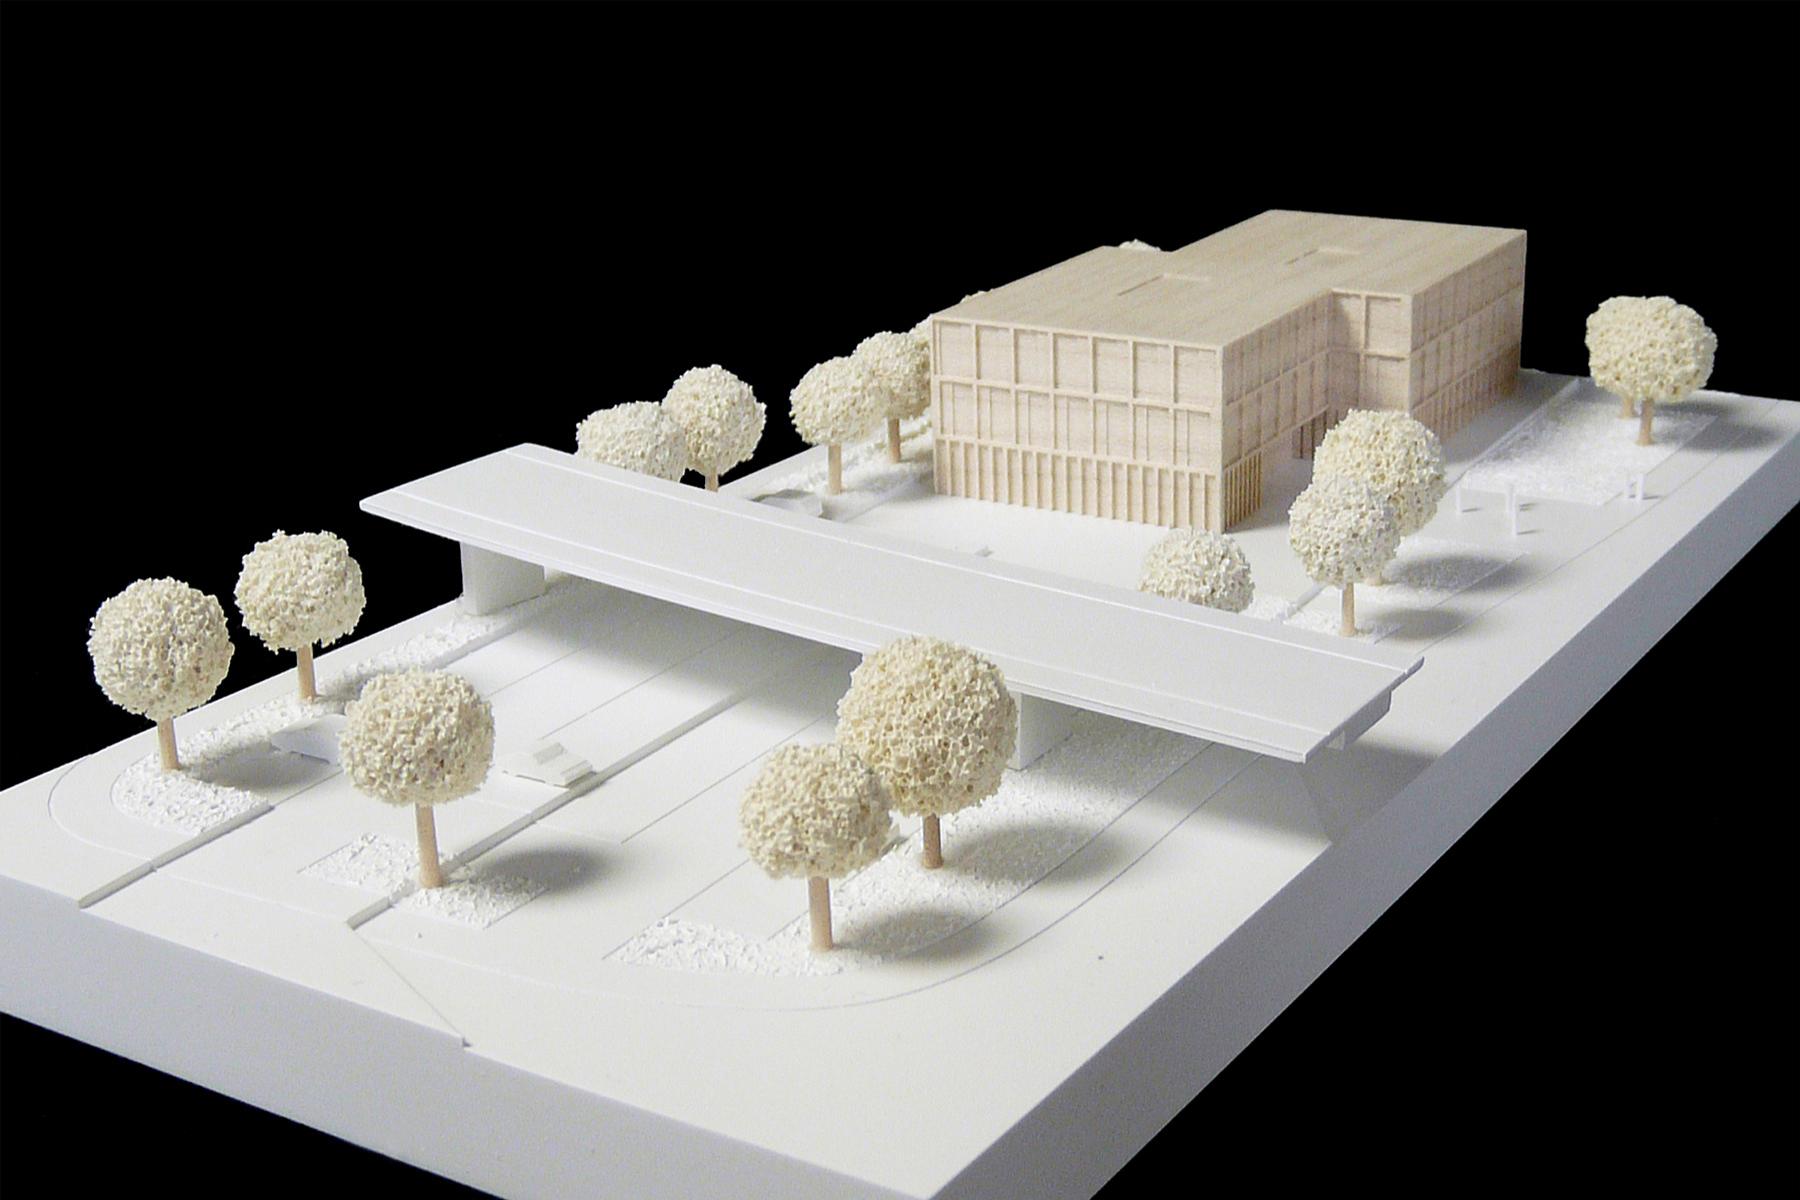 architekturmodell bkk kirchheim b la berec modellbau 1 500. Black Bedroom Furniture Sets. Home Design Ideas